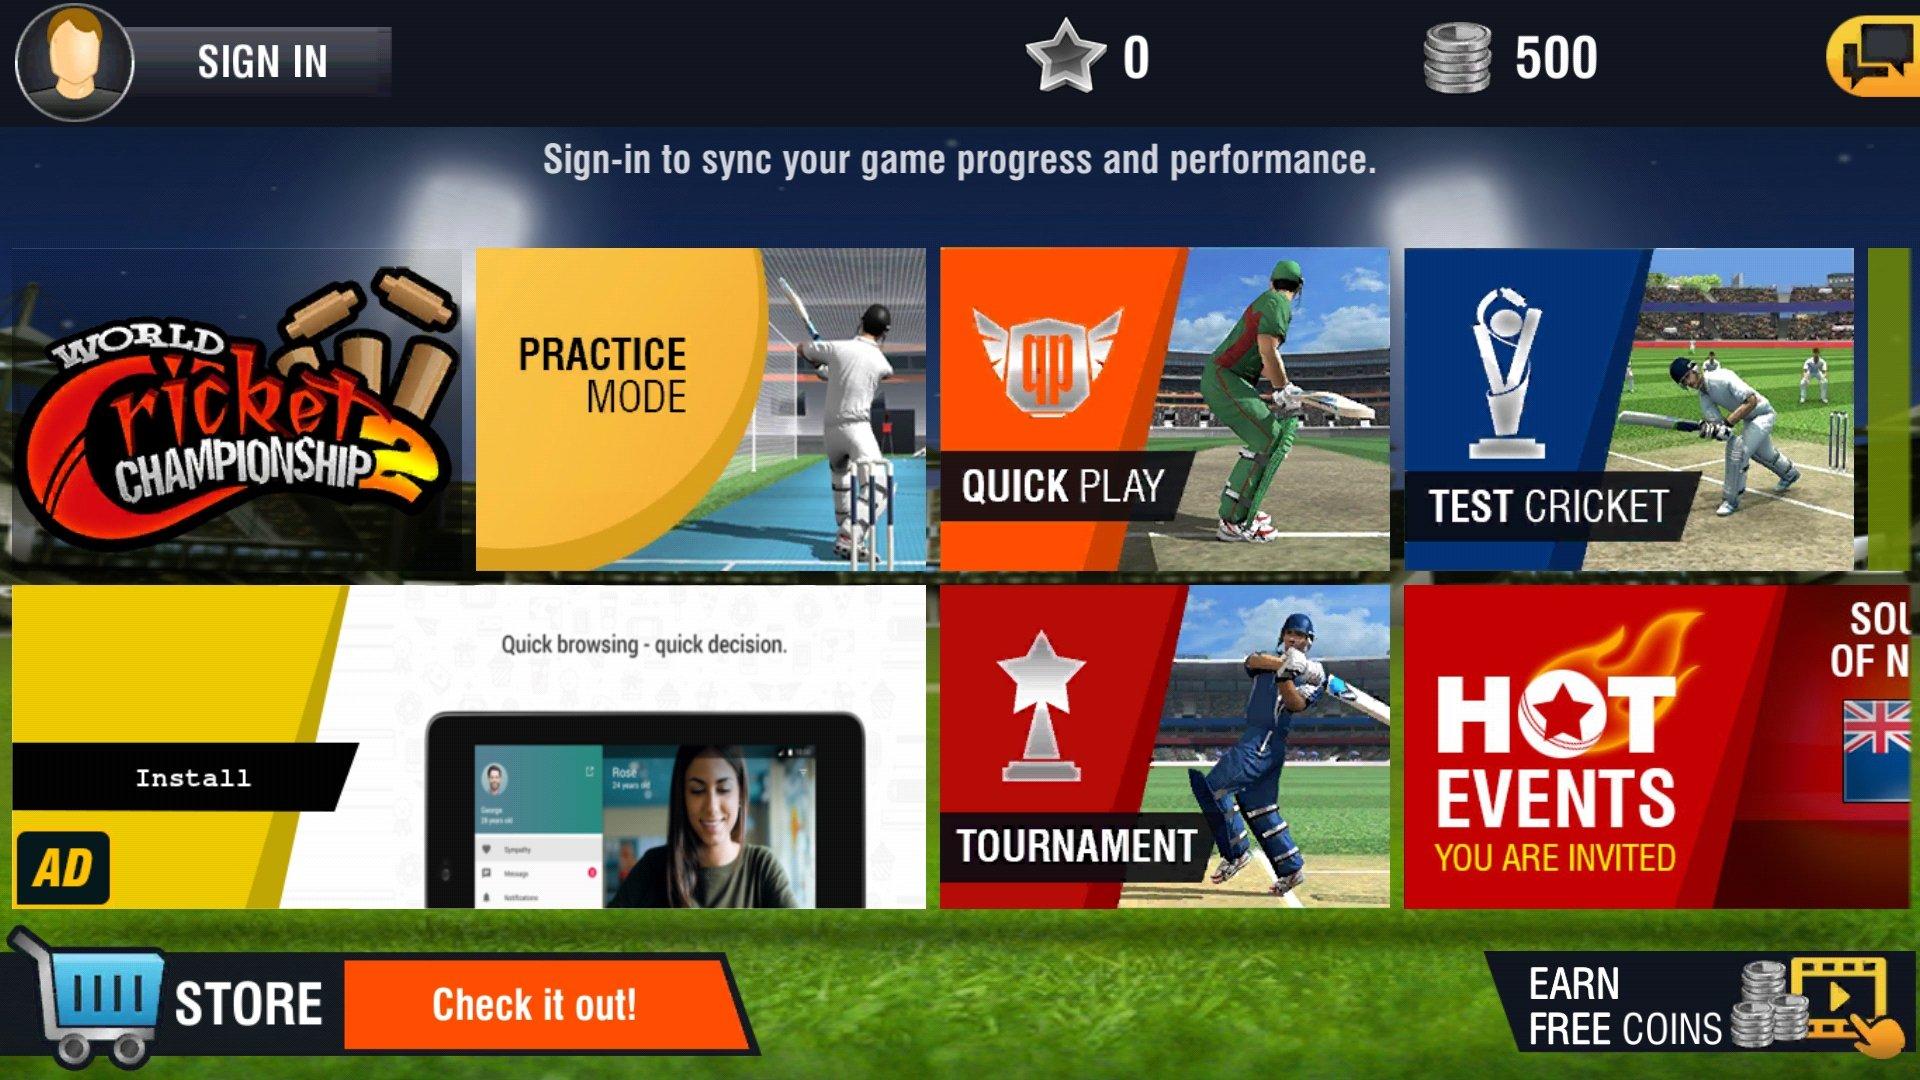 World Cricket Championship 2 Android image 8